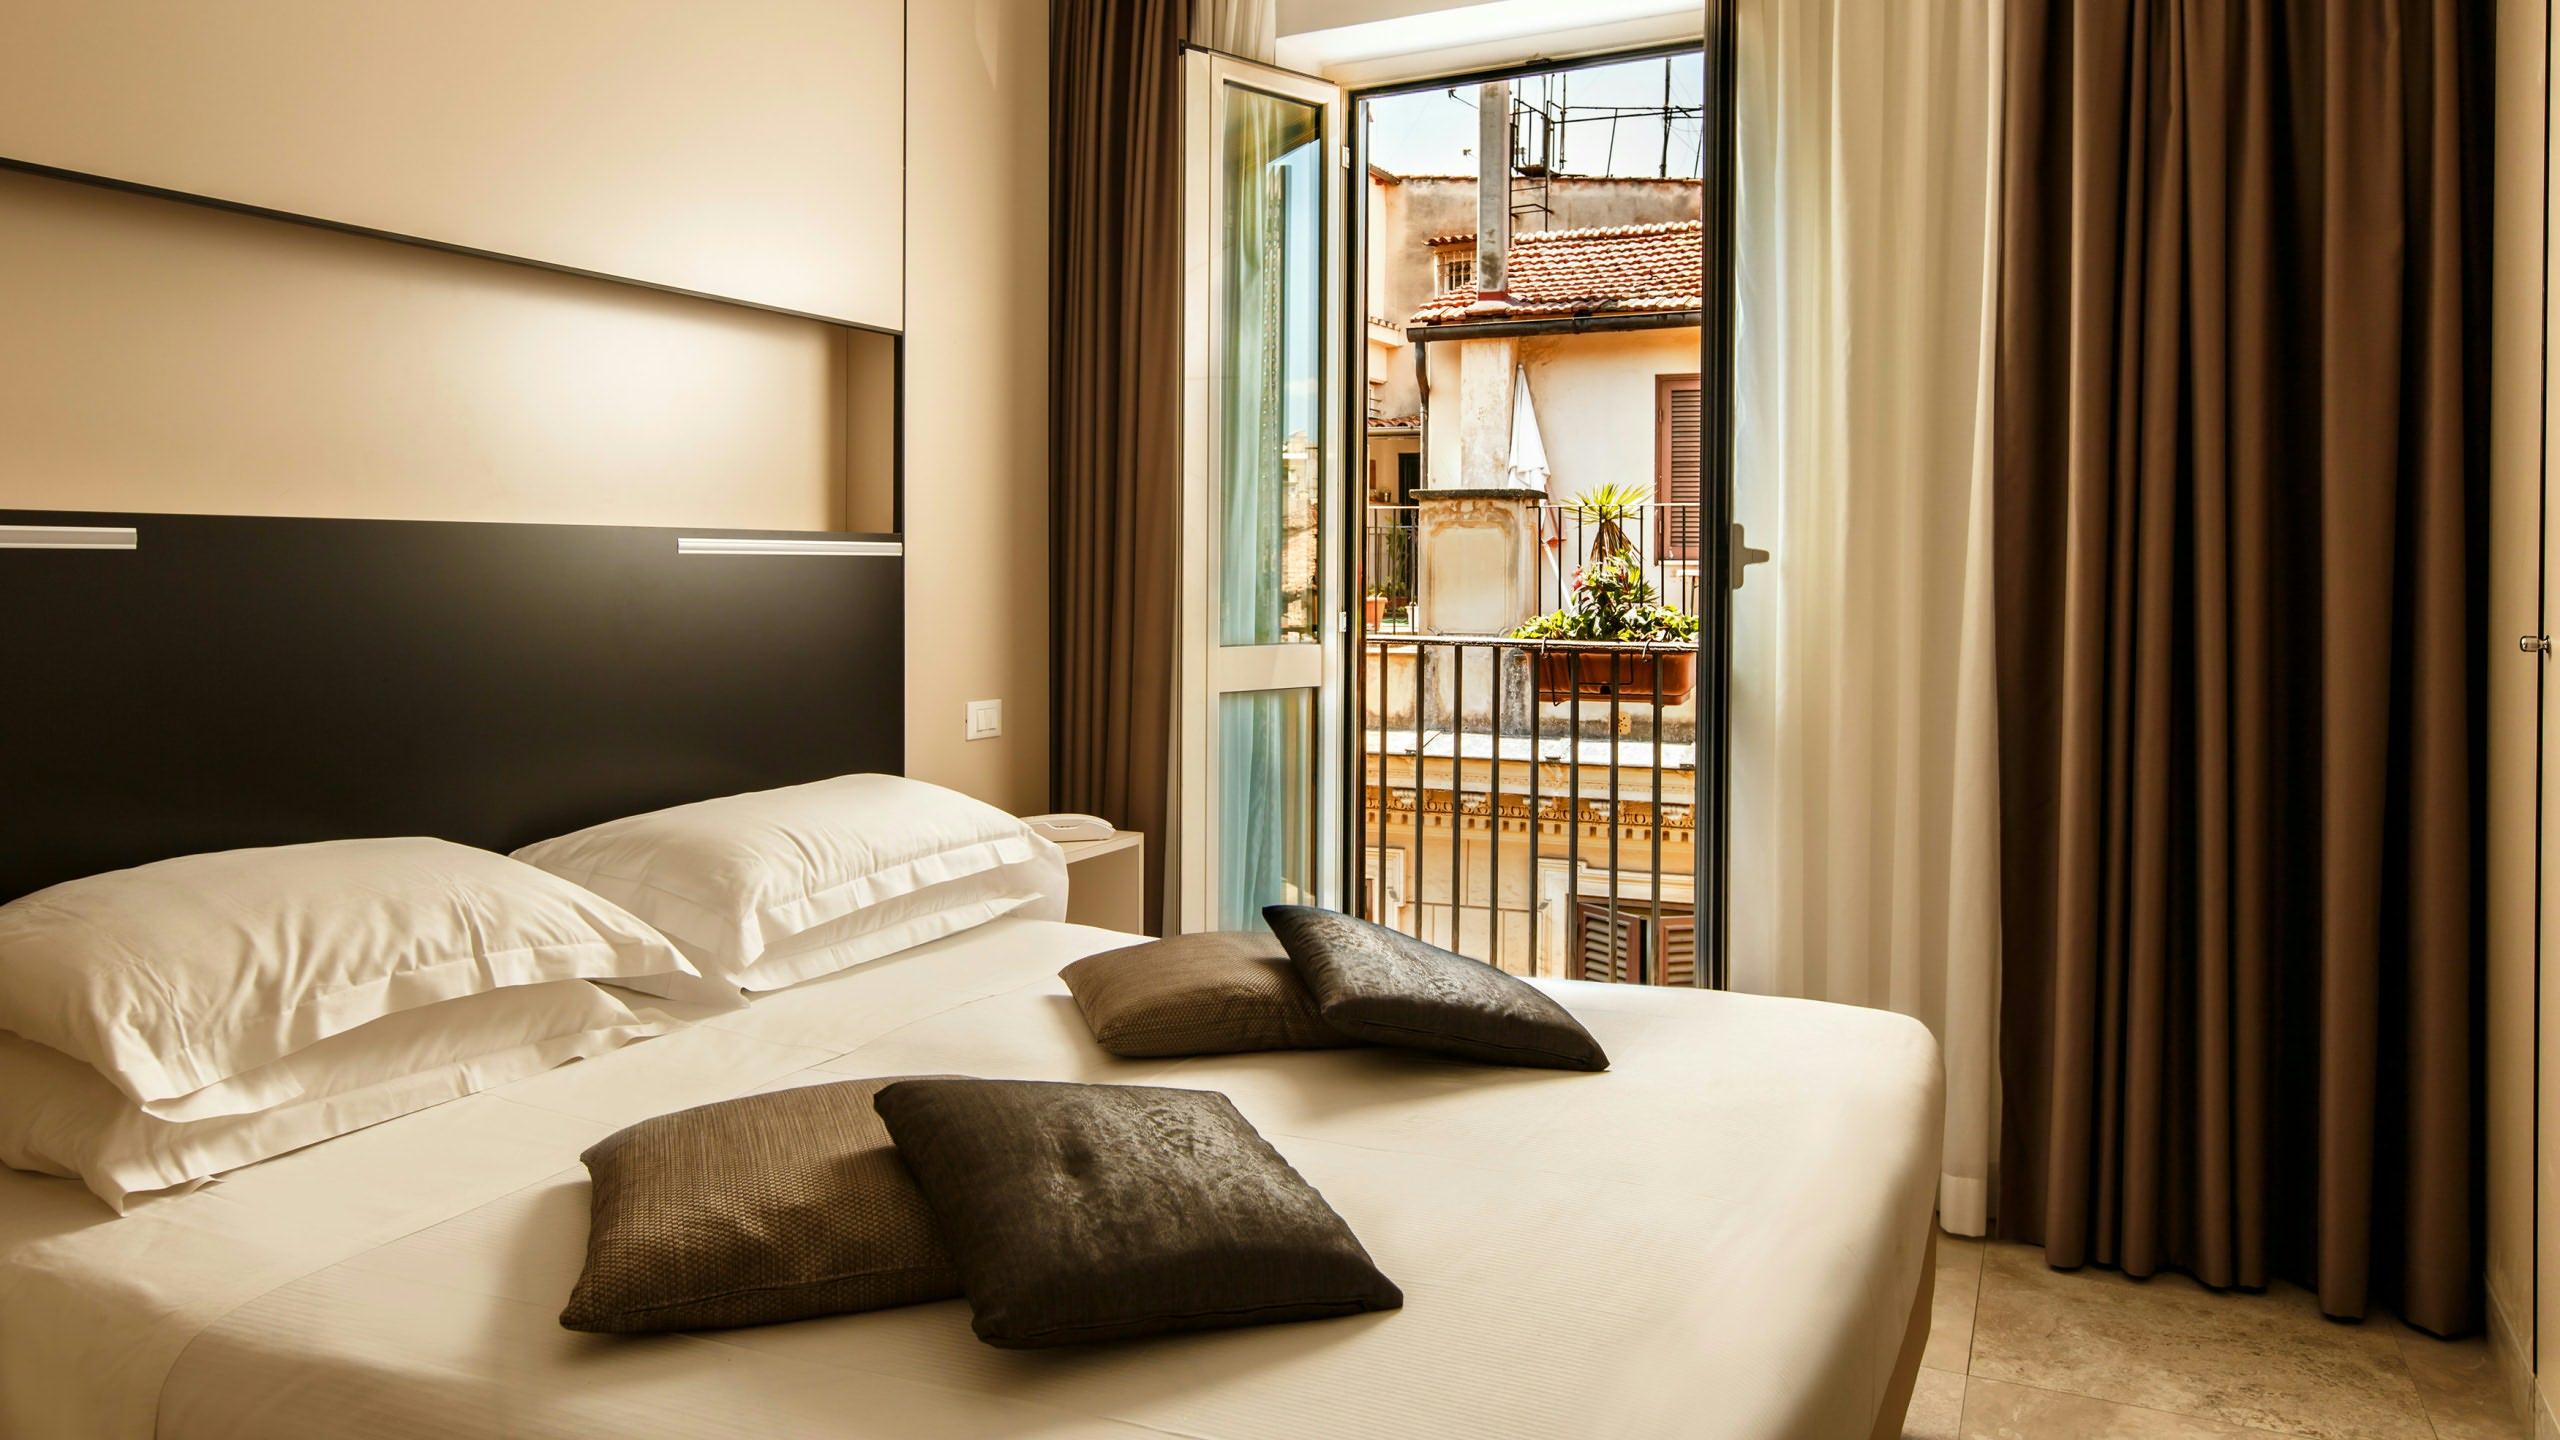 hotel-smeraldo-roma-slide3